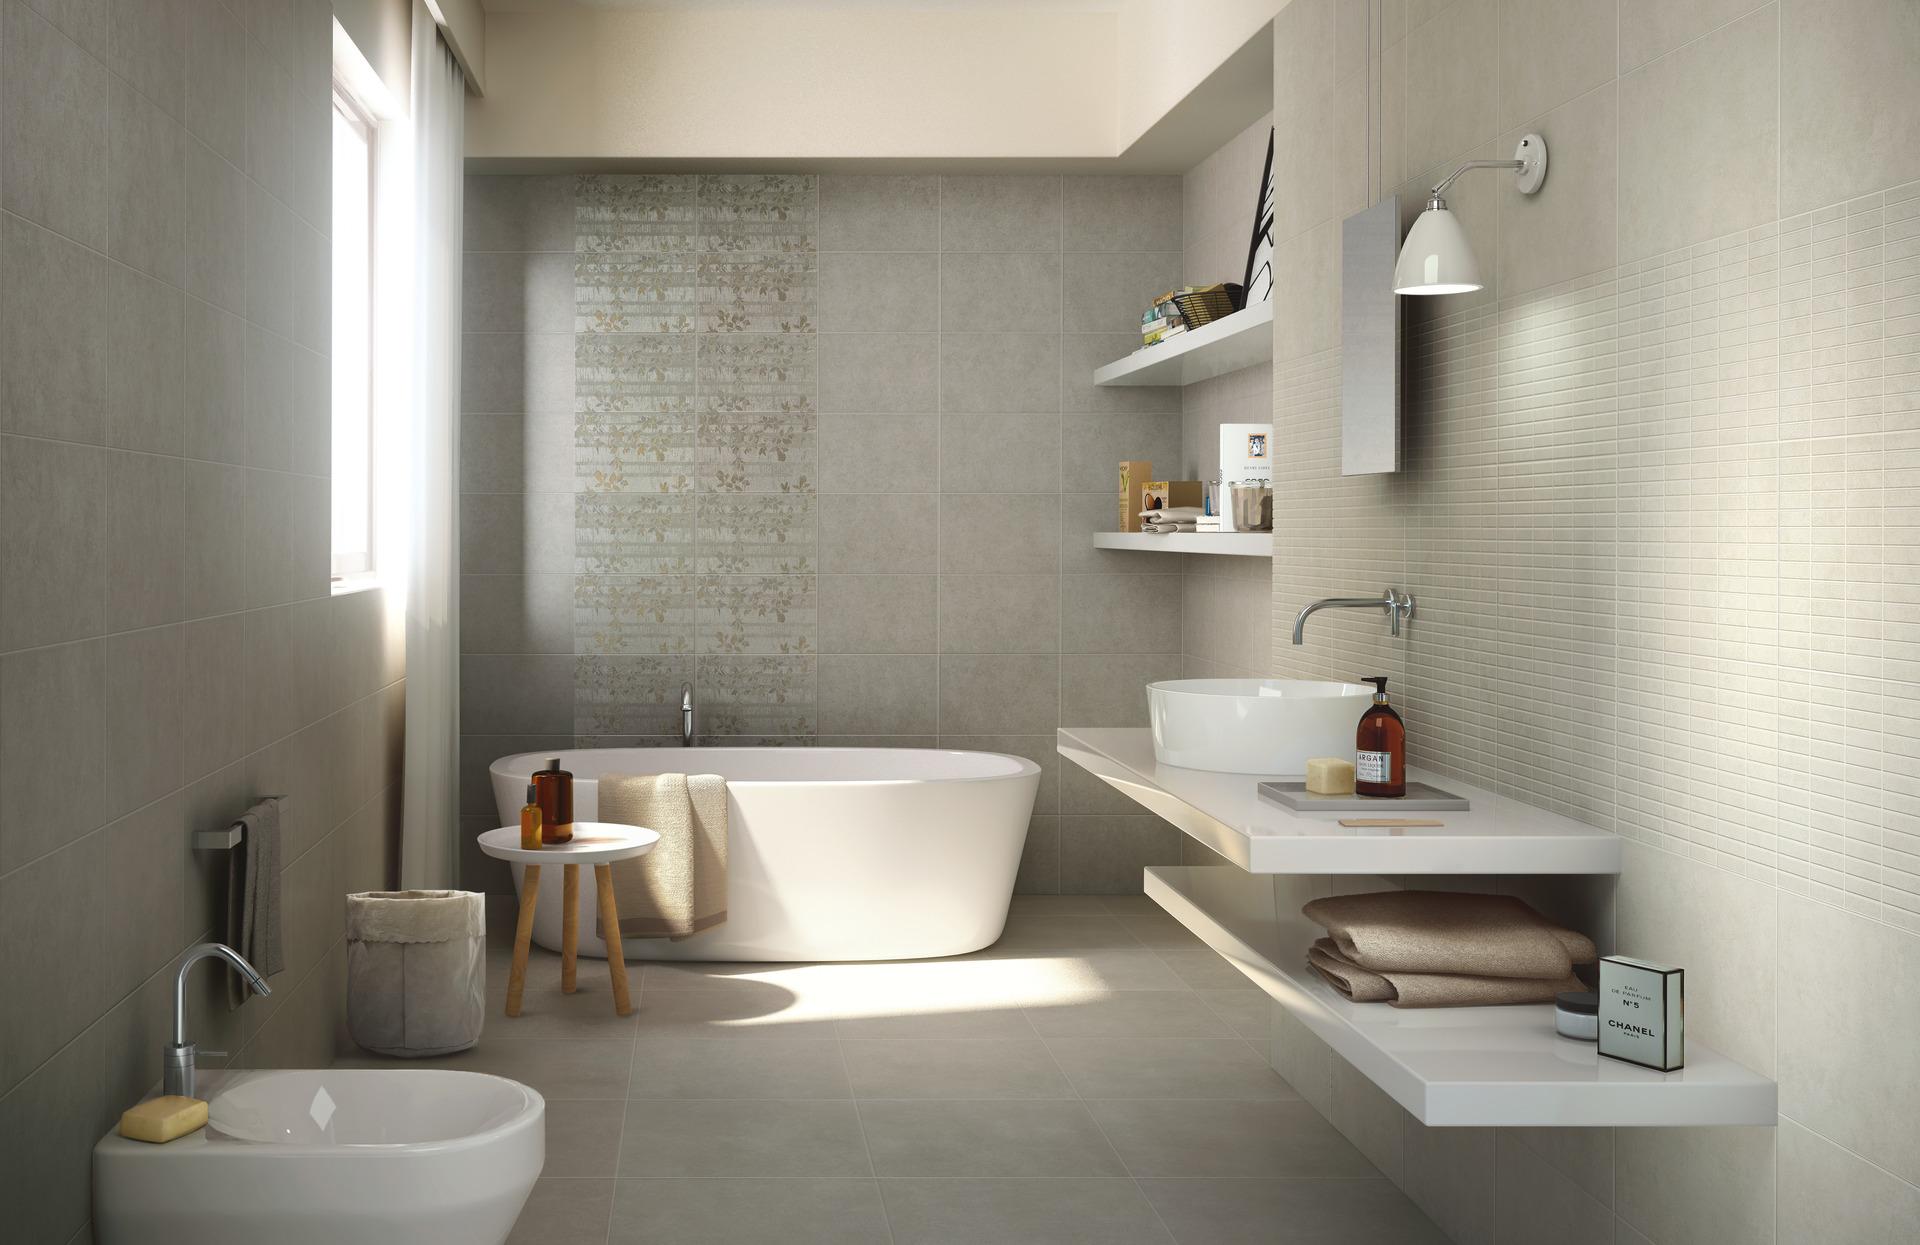 Piastrelle bagno marrone rs71 regardsdefemmes for Idee rivestimento bagno